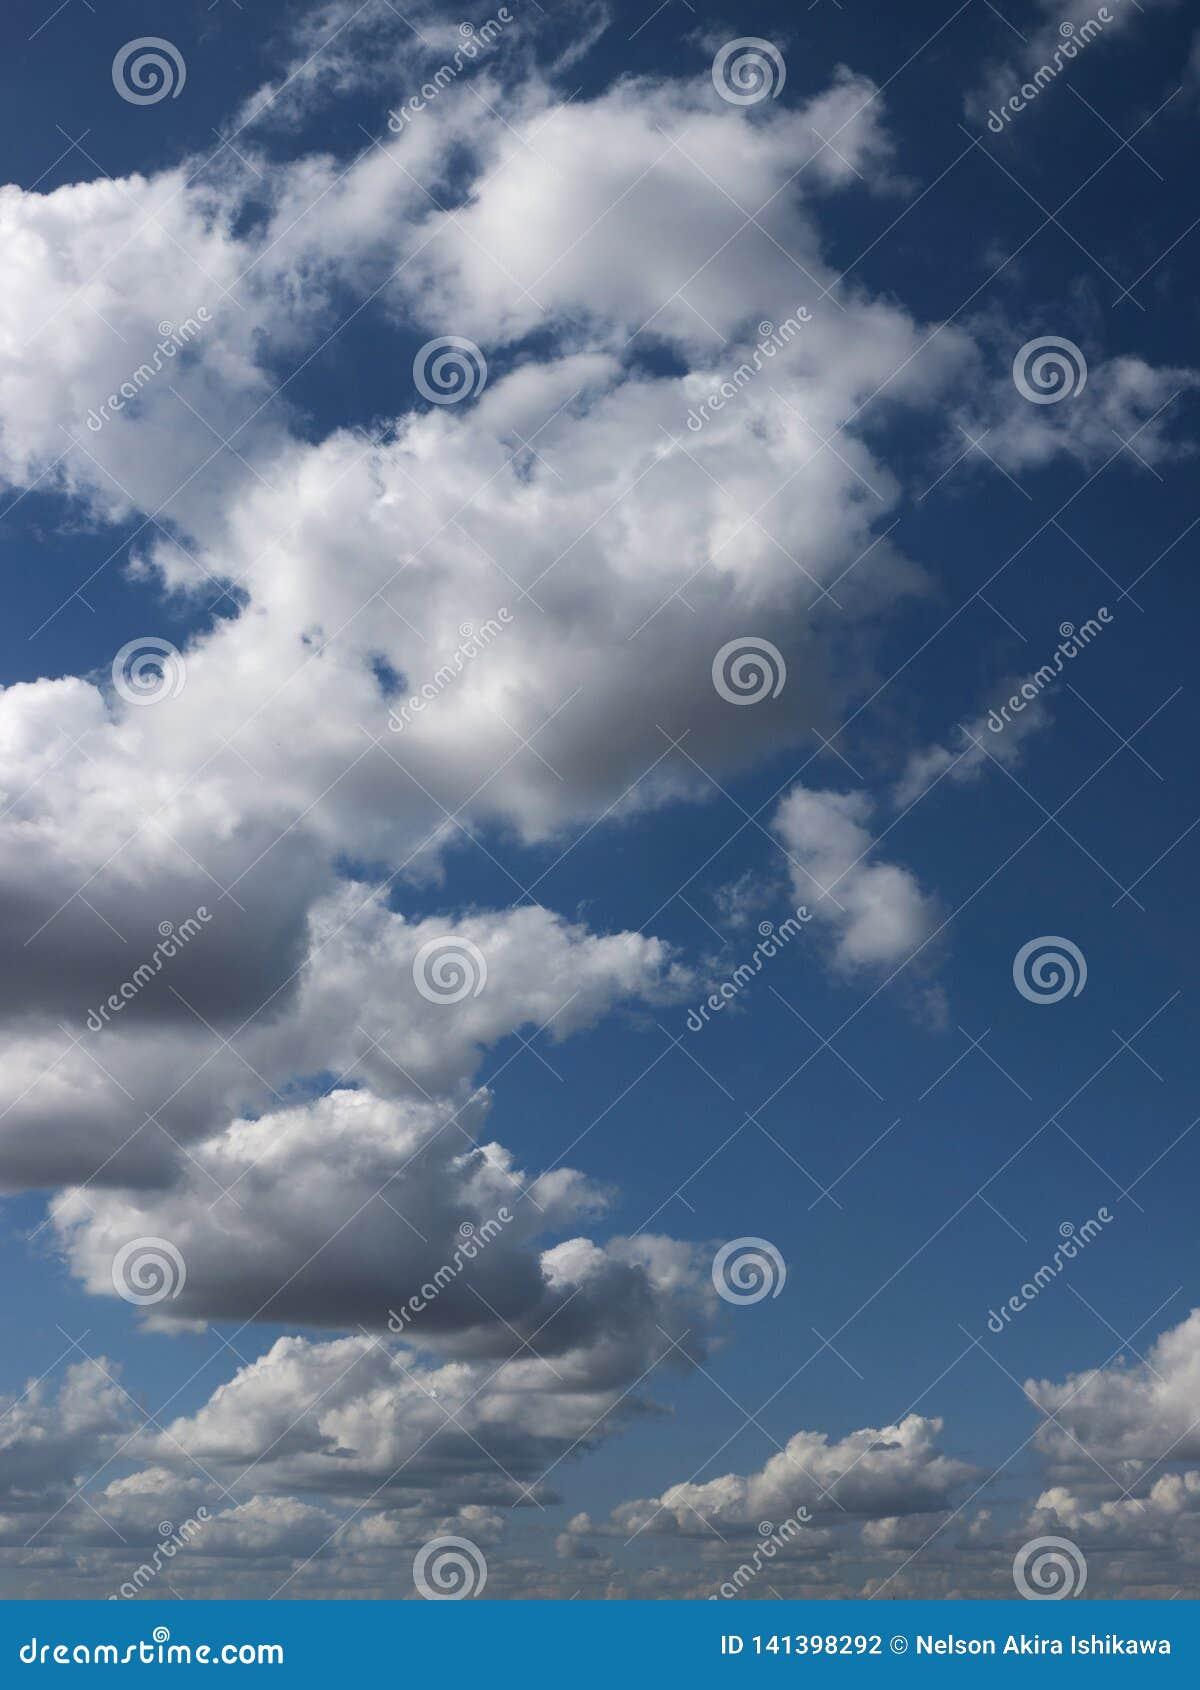 Cloudscape cloud blue backgrounds nature summer outdoors midair scene